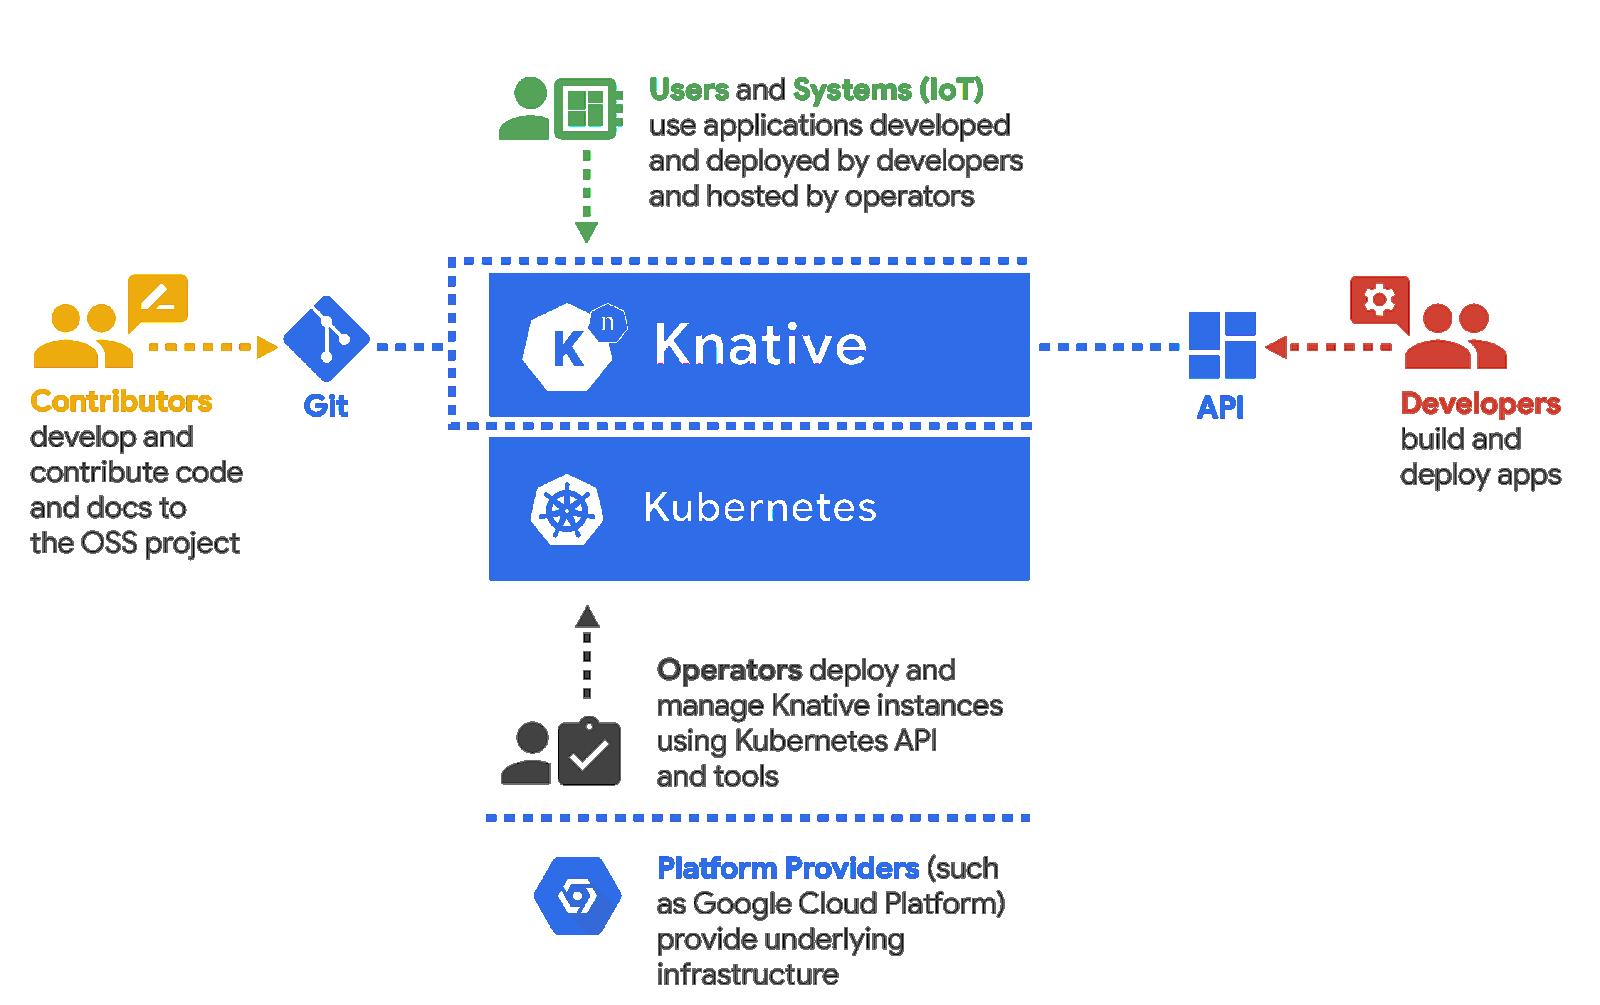 Install Knative on Kubernetes - instruqt